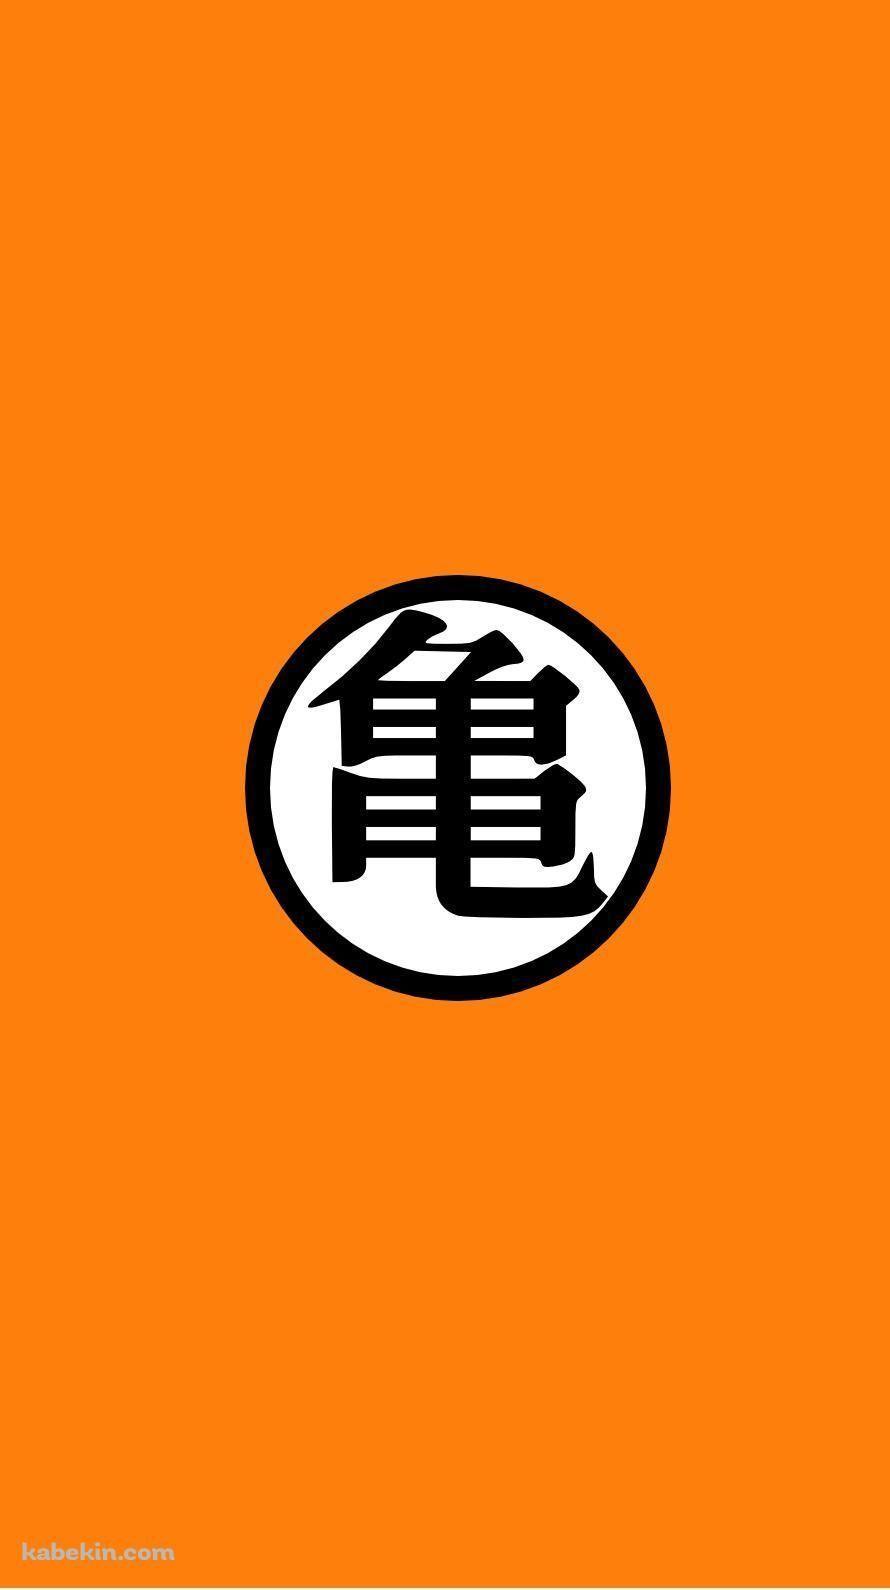 Dragon Ball Z Iphone Wallpapers Top Free Dragon Ball Z